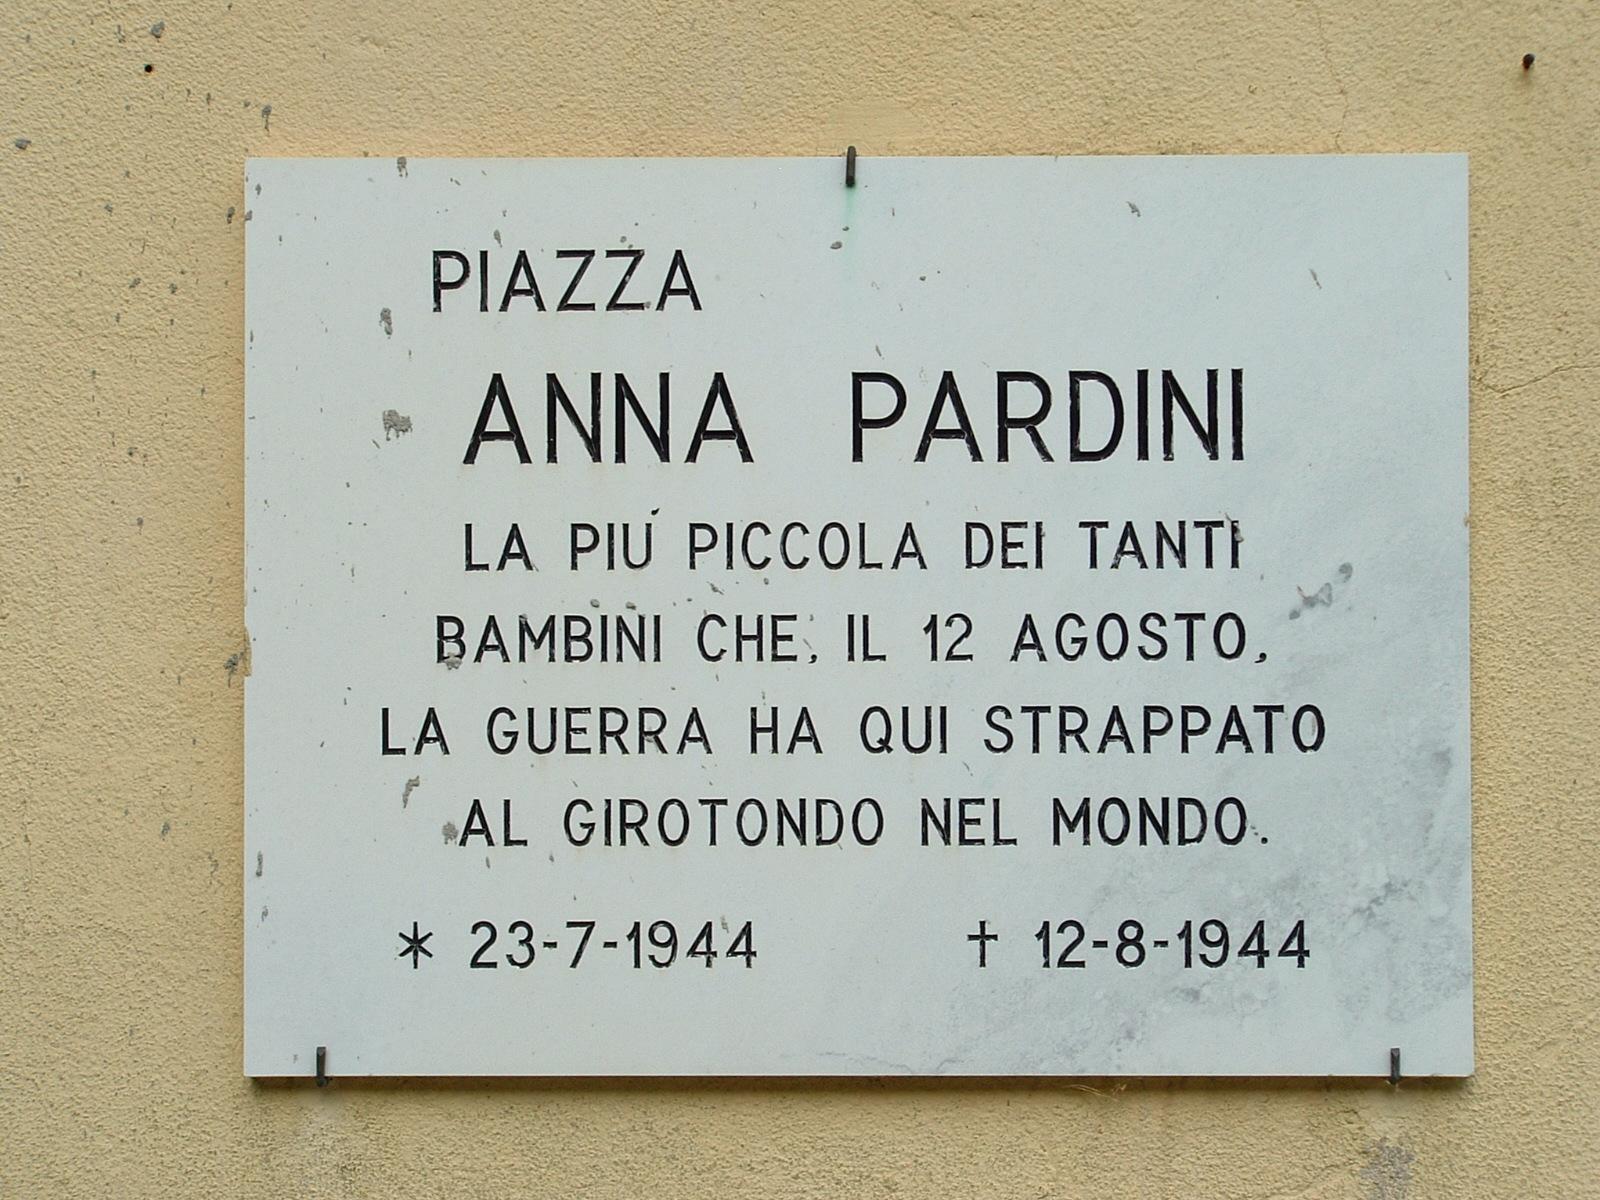 Targa in Piazza Anna Pardini, Sant'Anna di Stazzema, Lucca